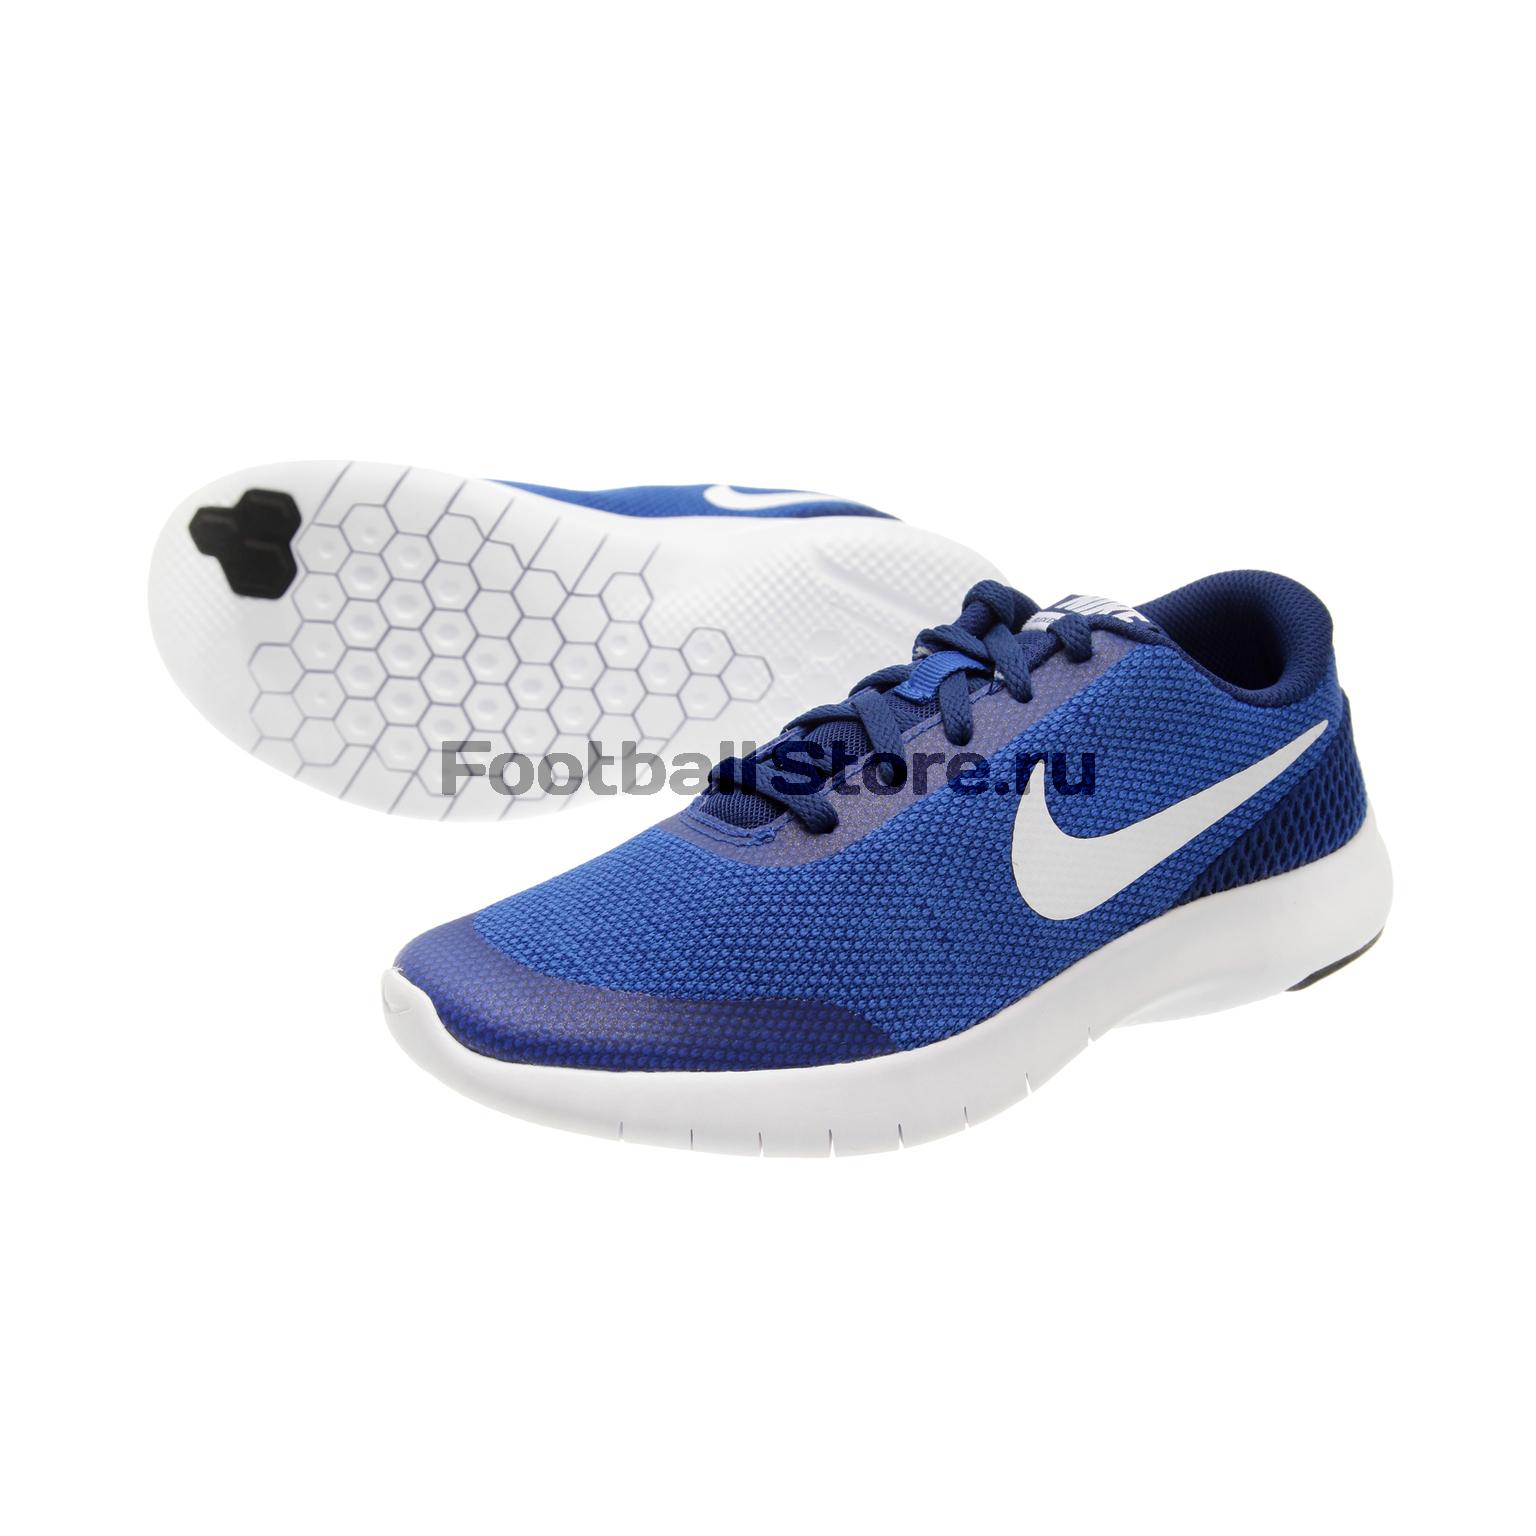 Кроссовки Nike Кроссовки детские Nike Flex Experience RN7 943284-400 кроссовки nike кроссовки nike free rn gs